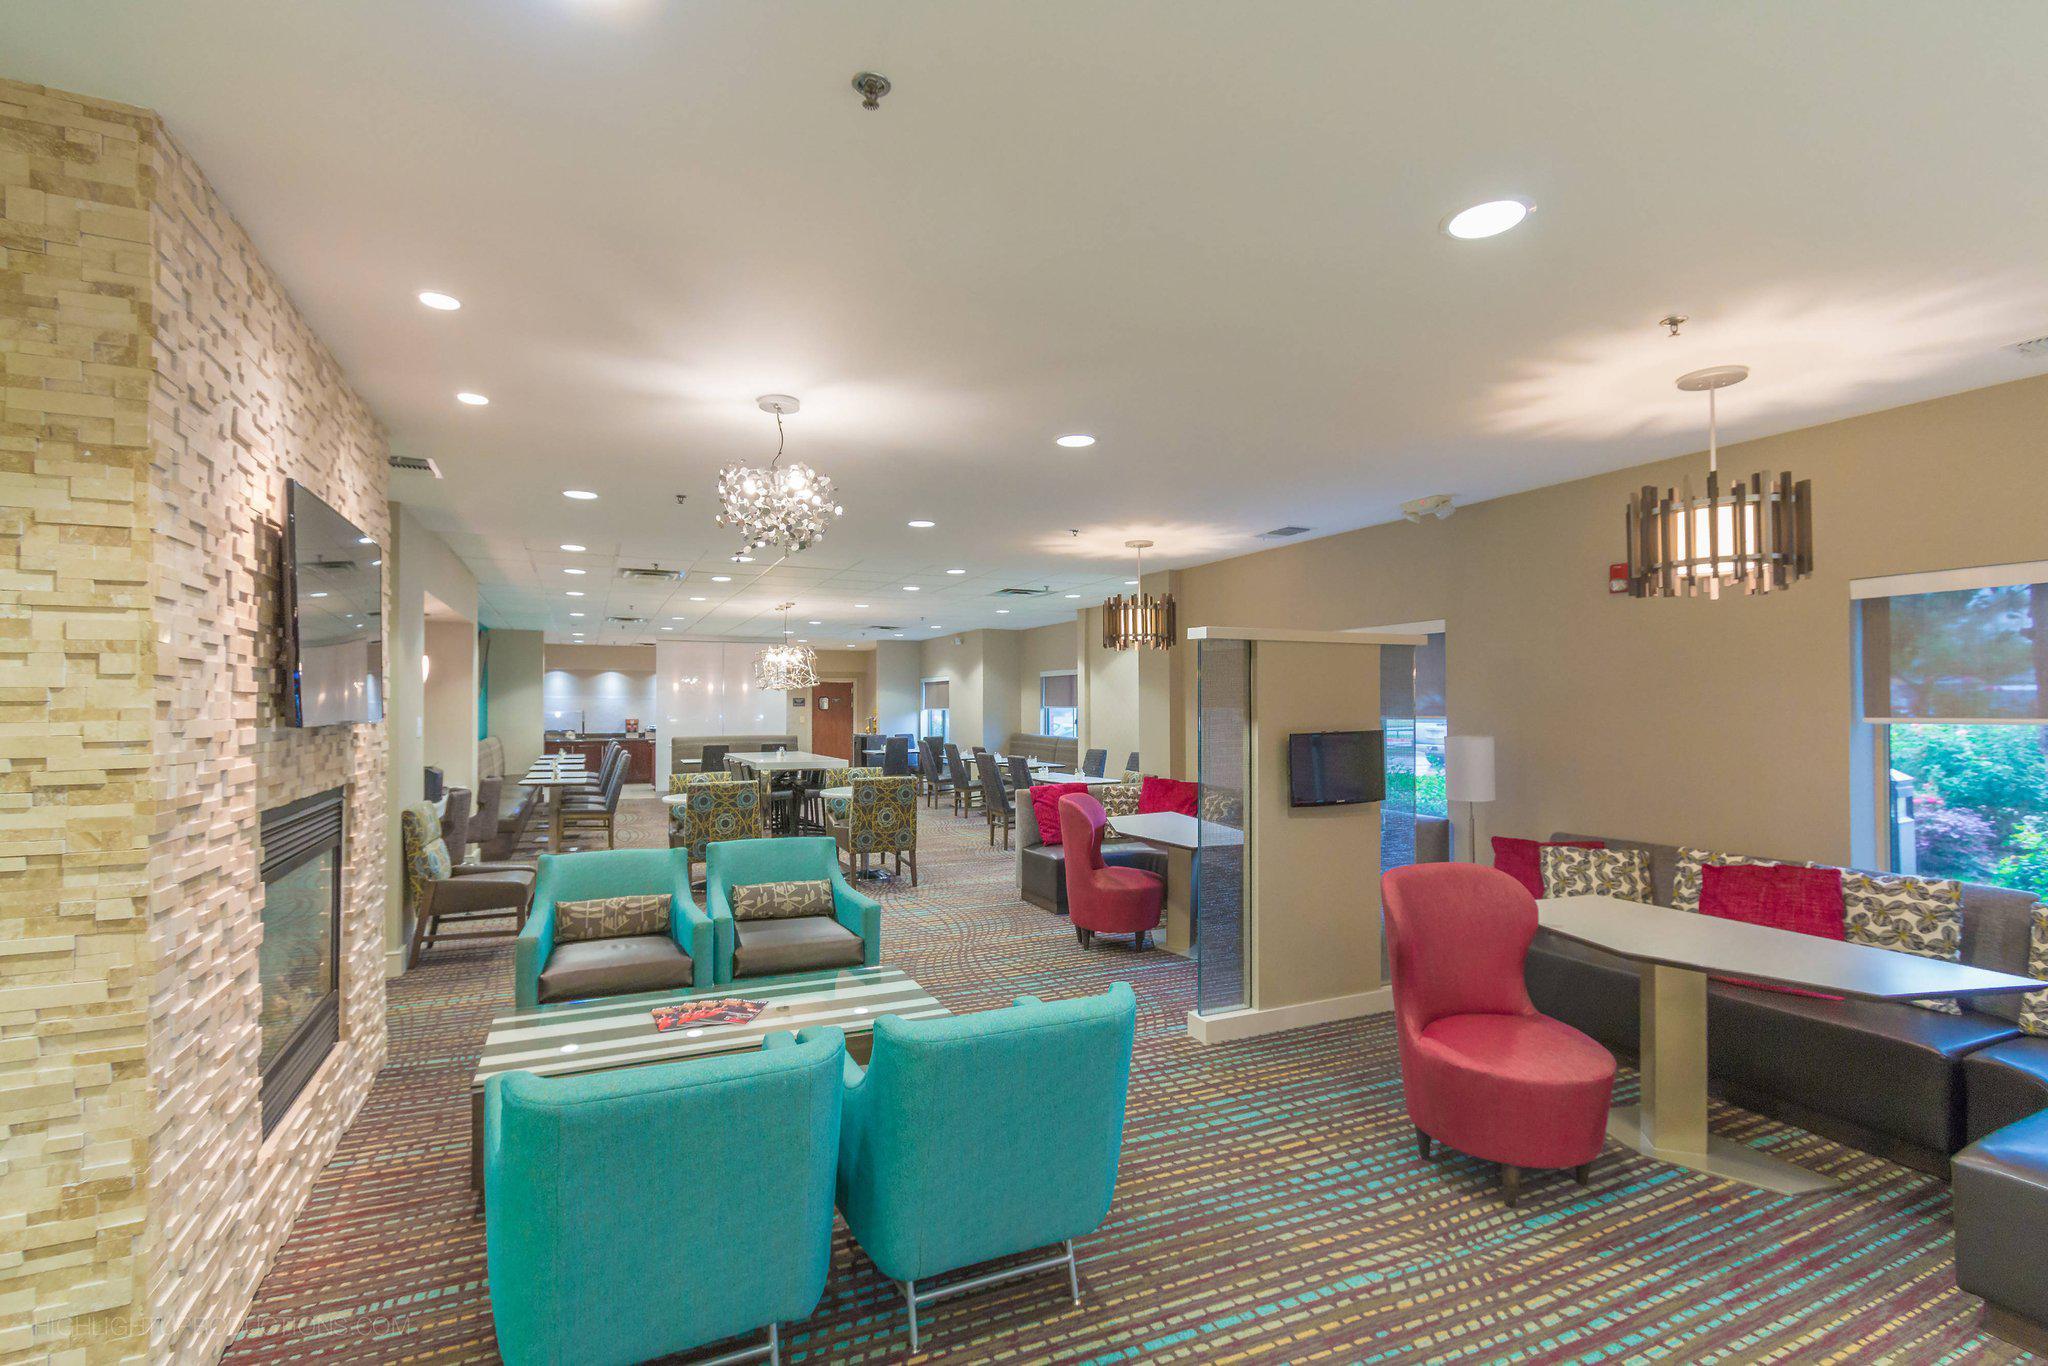 Residence Inn by Marriott Fort Worth Alliance Airport